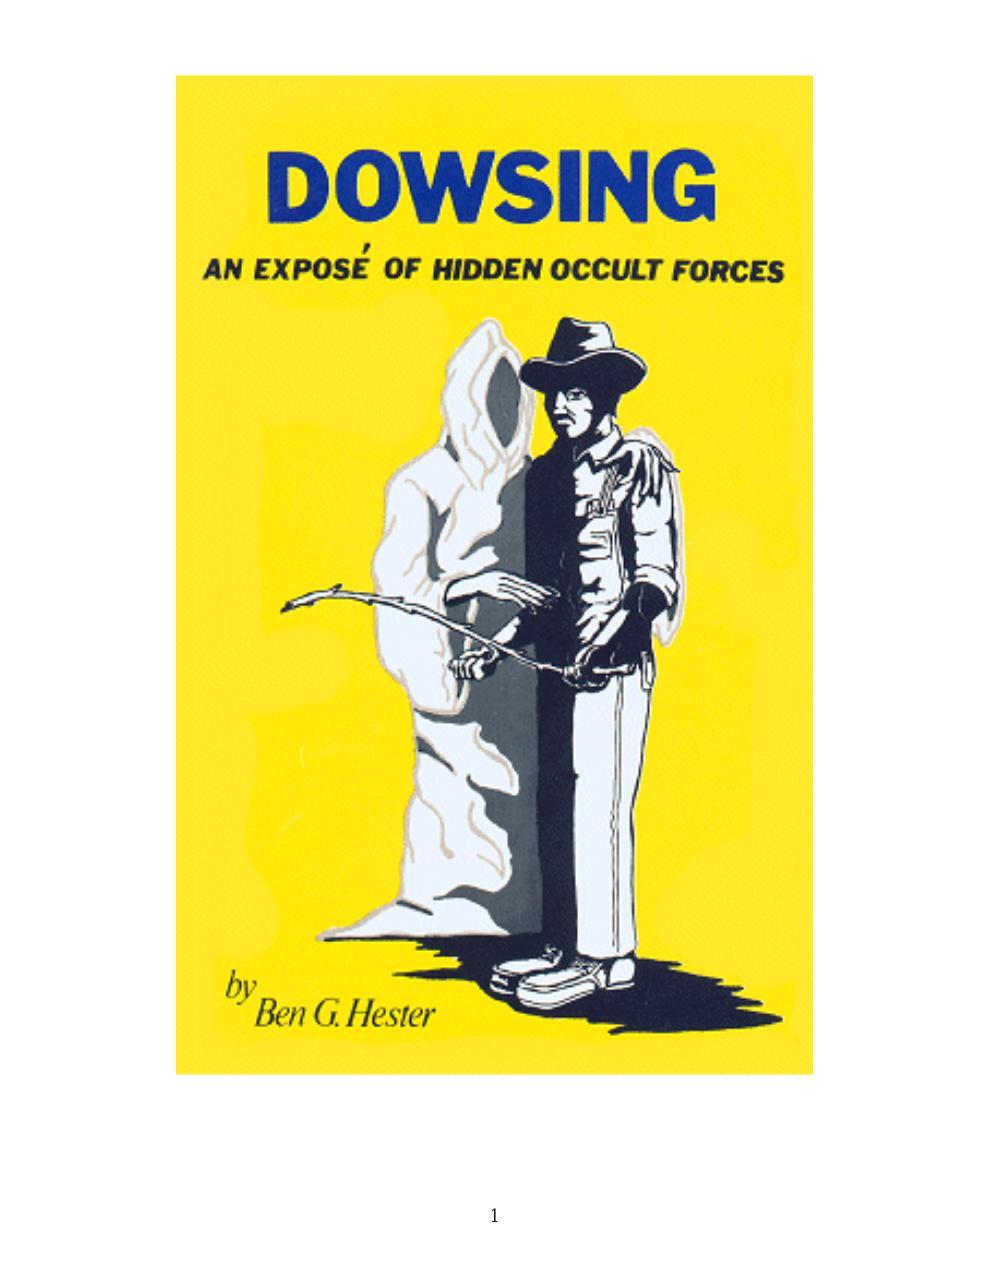 Ben G Hester] Dowsing An expose of hidden occult - PDF Archive